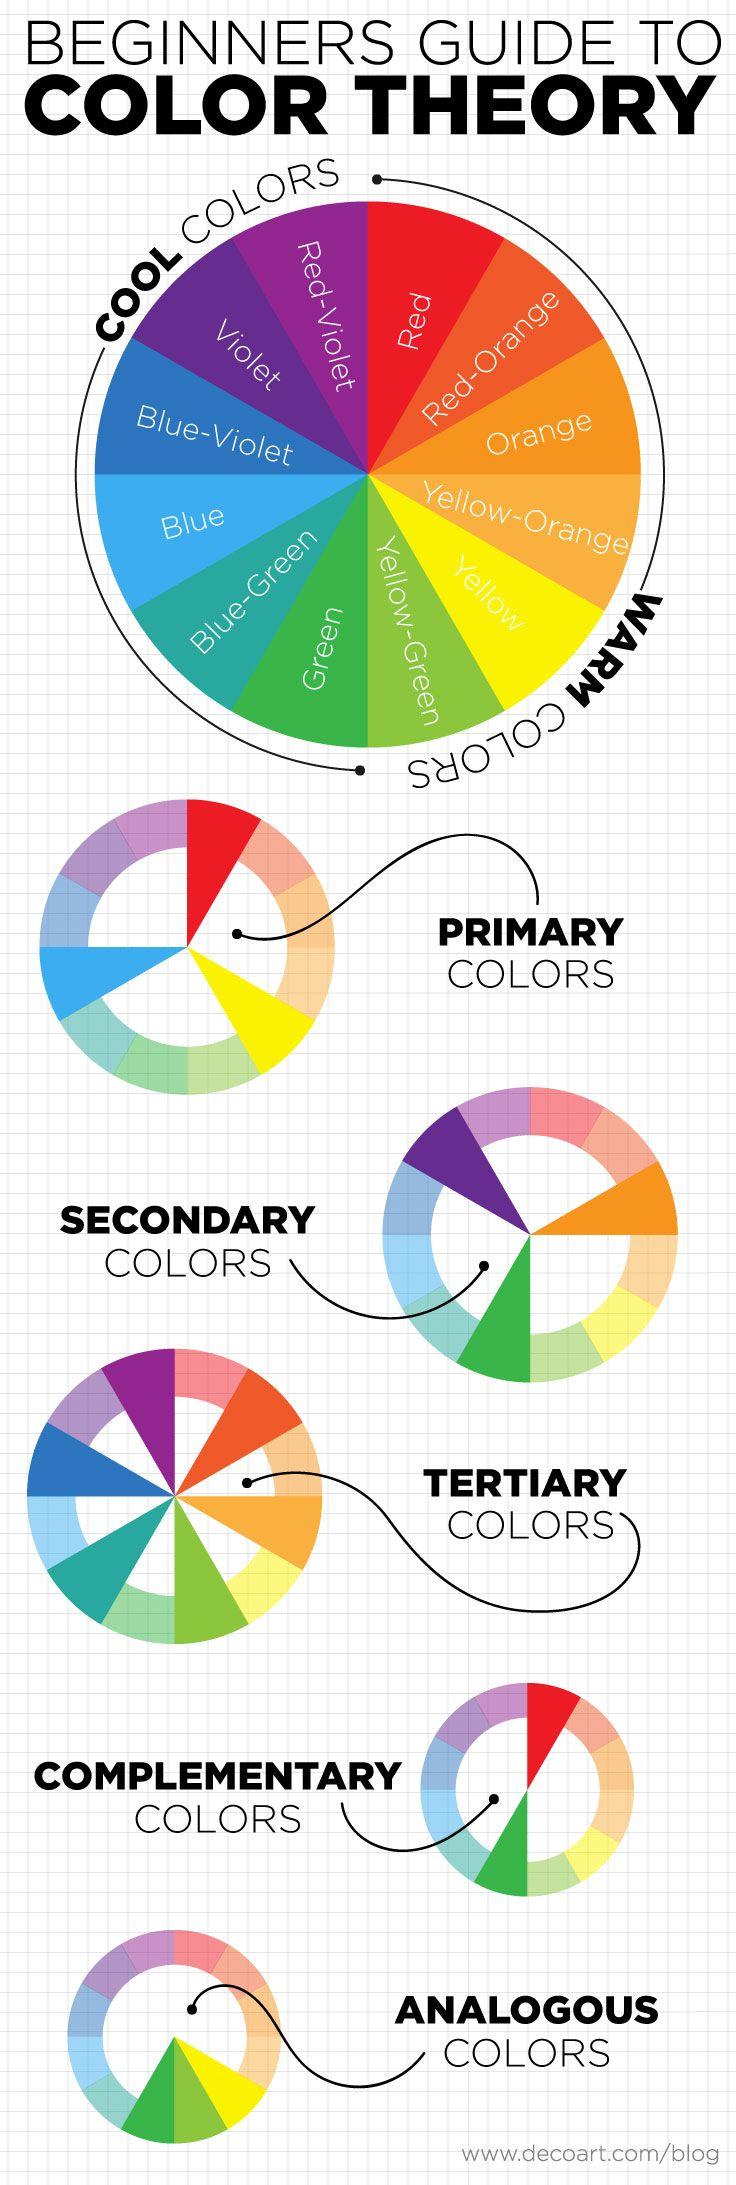 DecoArt Blog - NA - Color Theory Basics: The Color Wheel